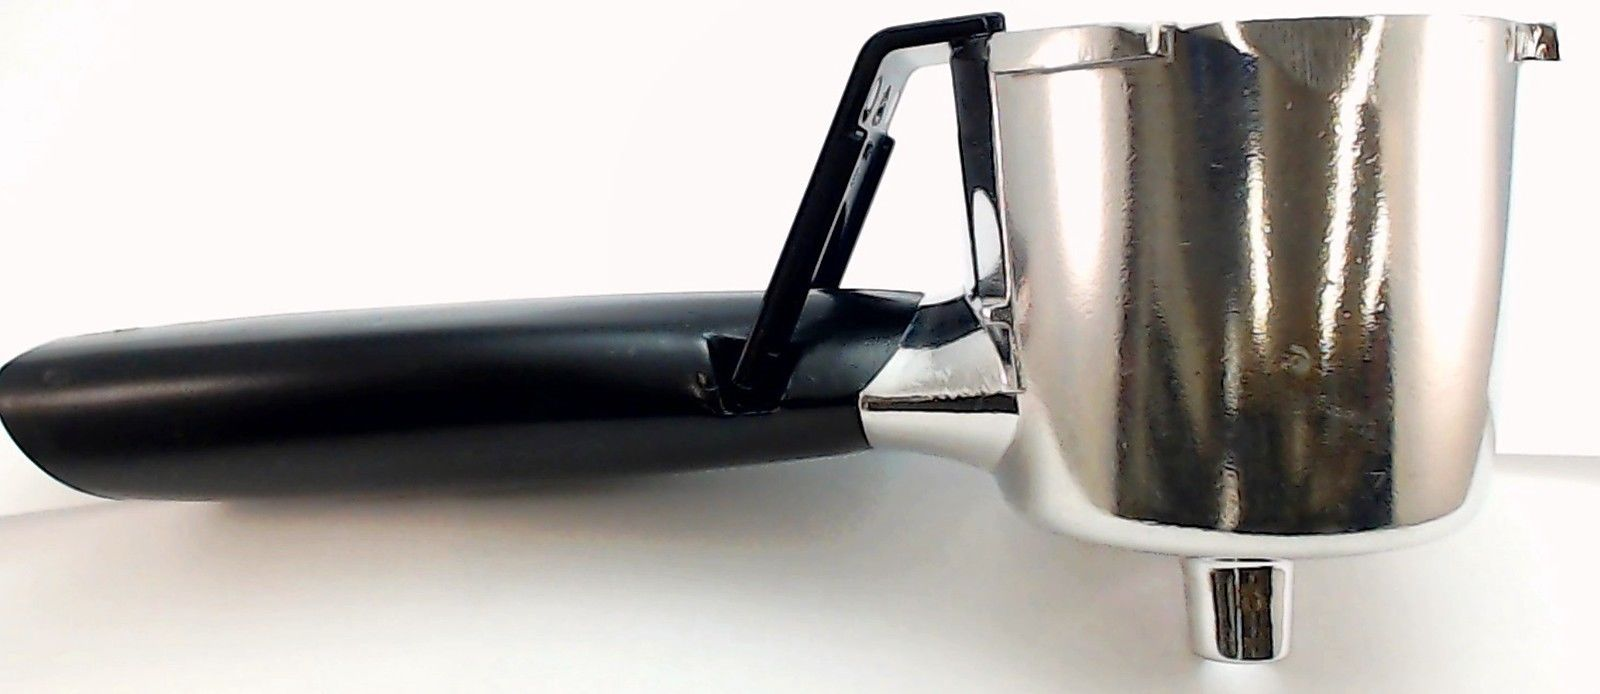 Espresso Filter Holder ~ Mr coffee espresso filter holder ecm  ebay